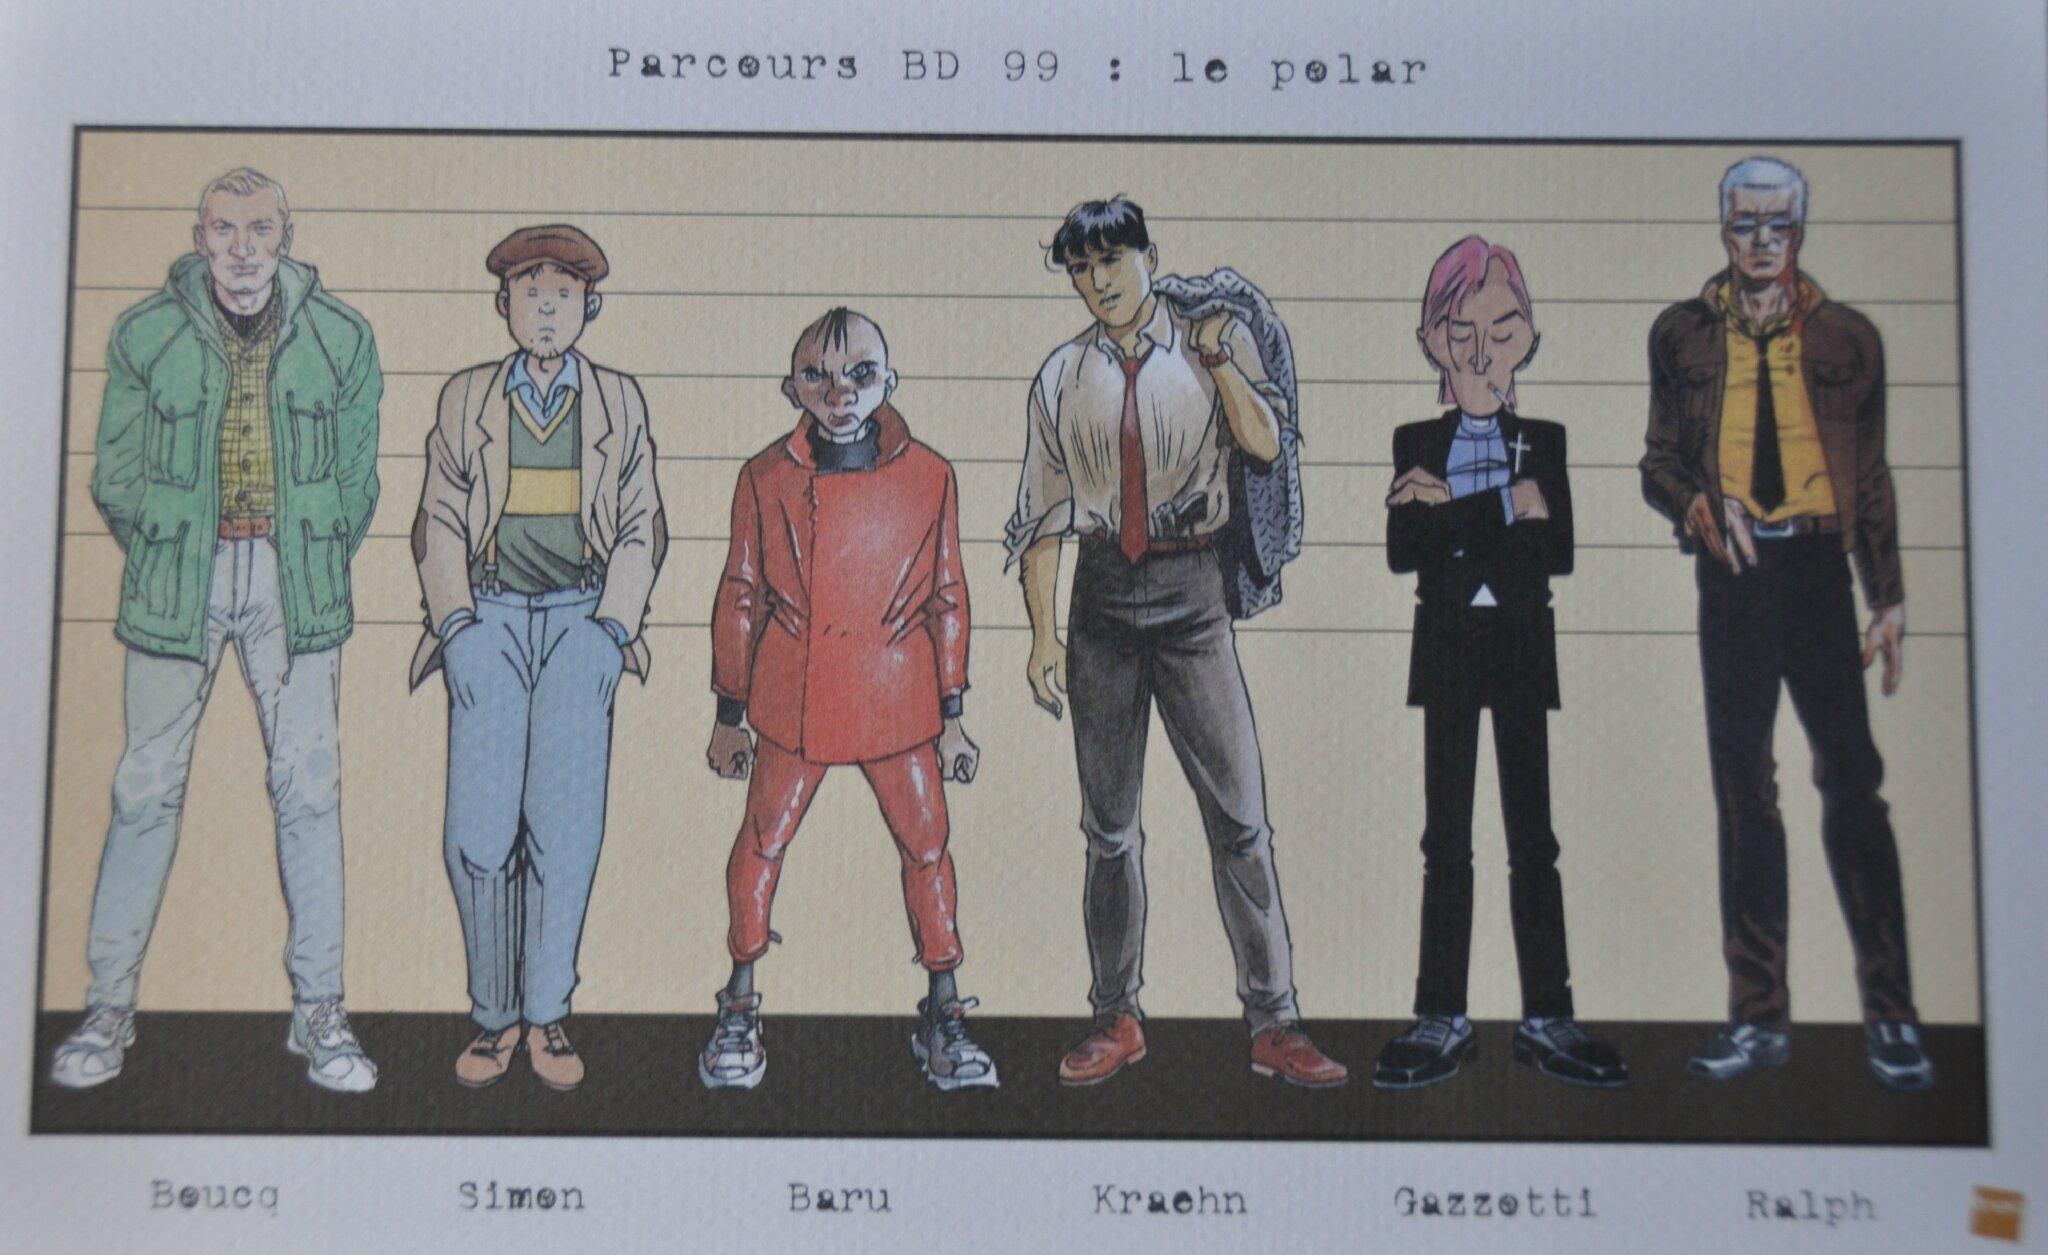 Ex-libris Le polar